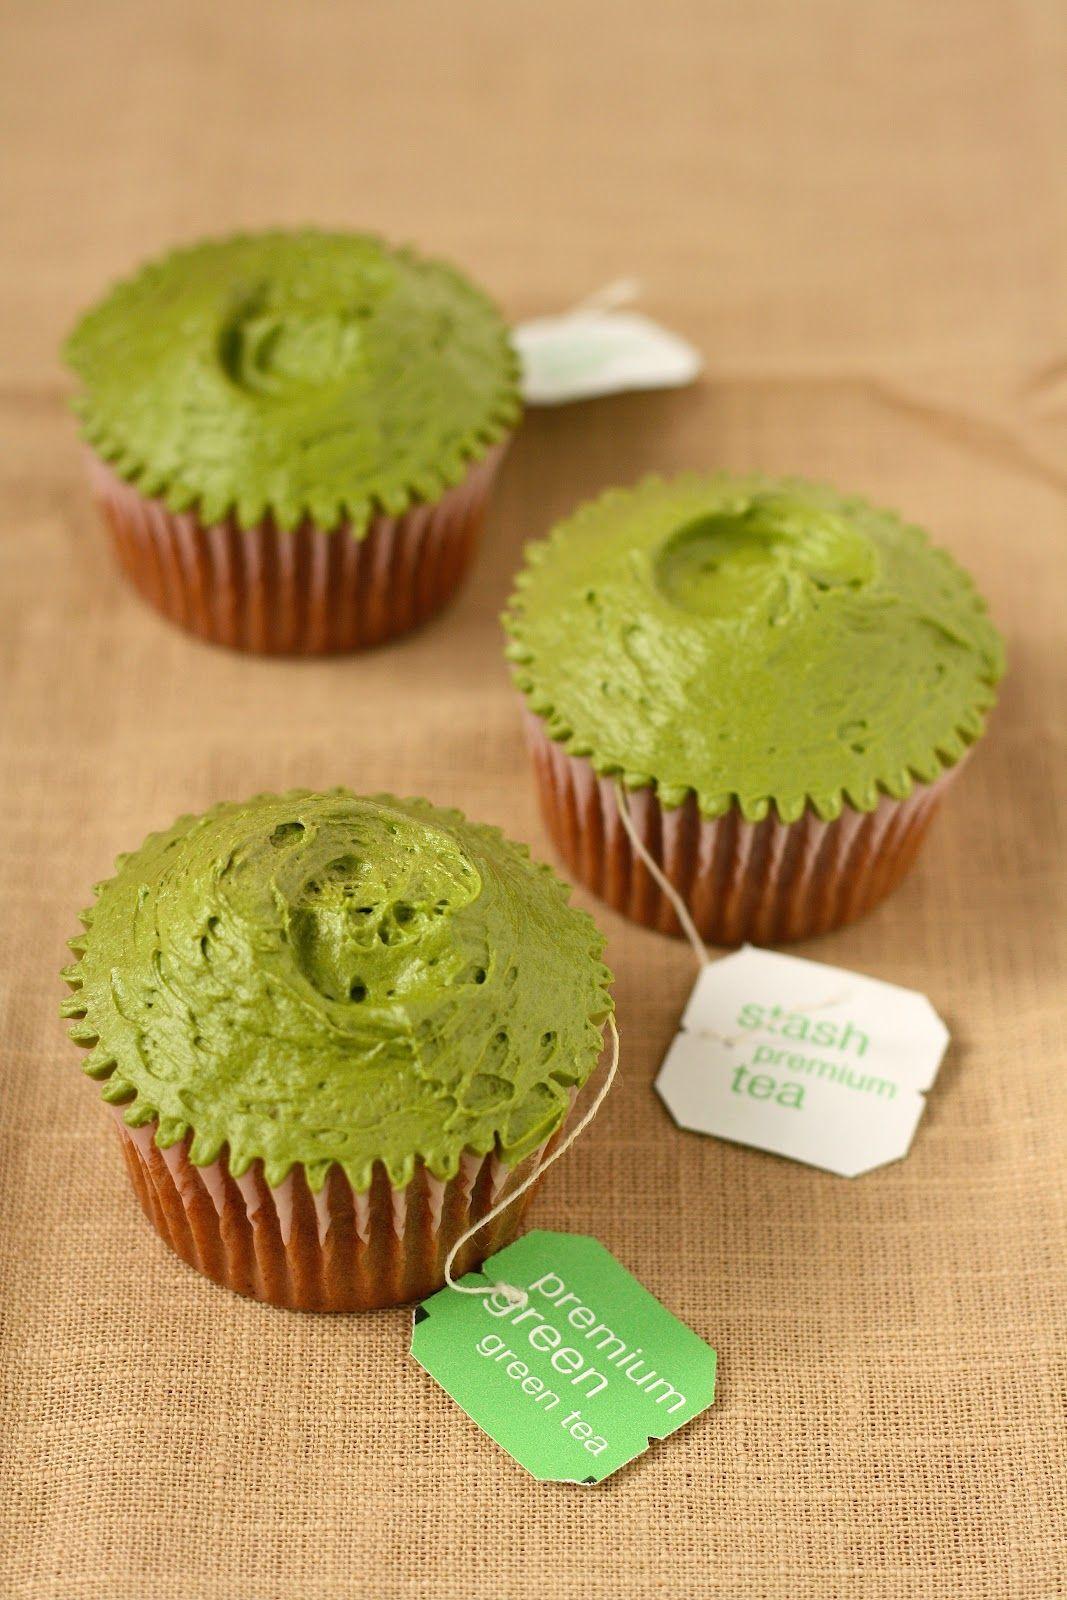 Hummingbird Bakery Green Tea Cupcakes